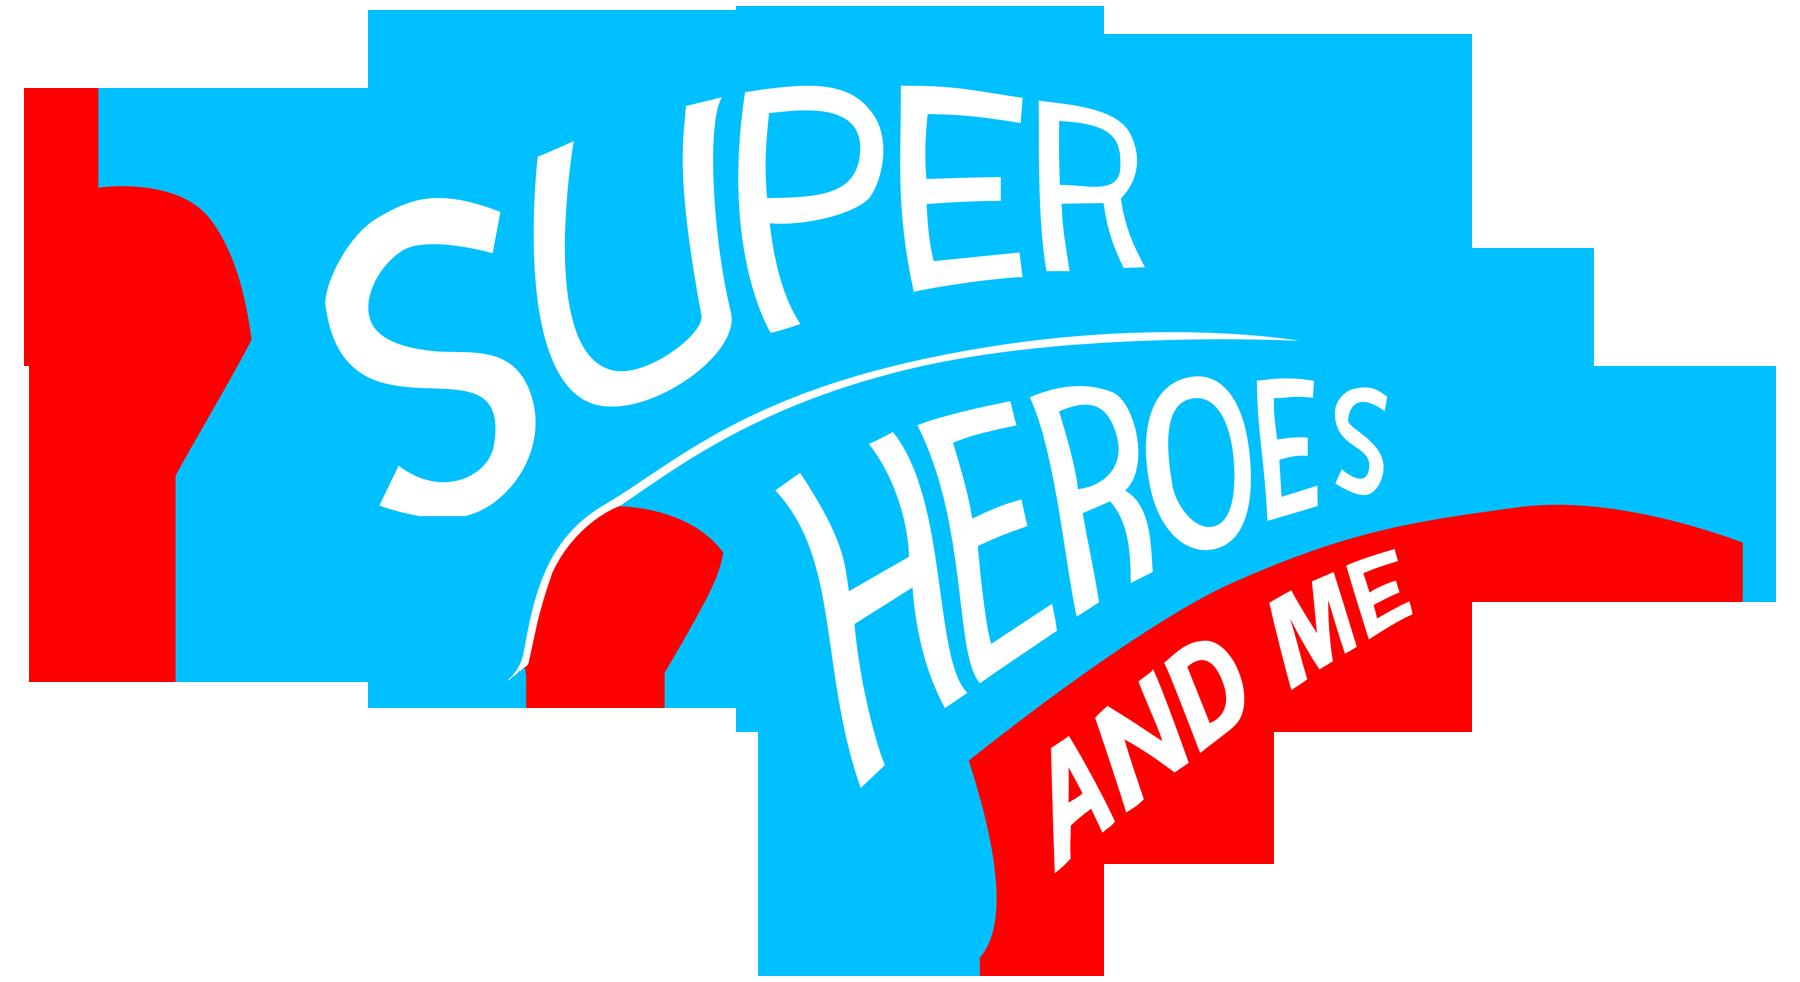 Mapping the Superheroes of (Batman) Melbourne — Superheroes & Me